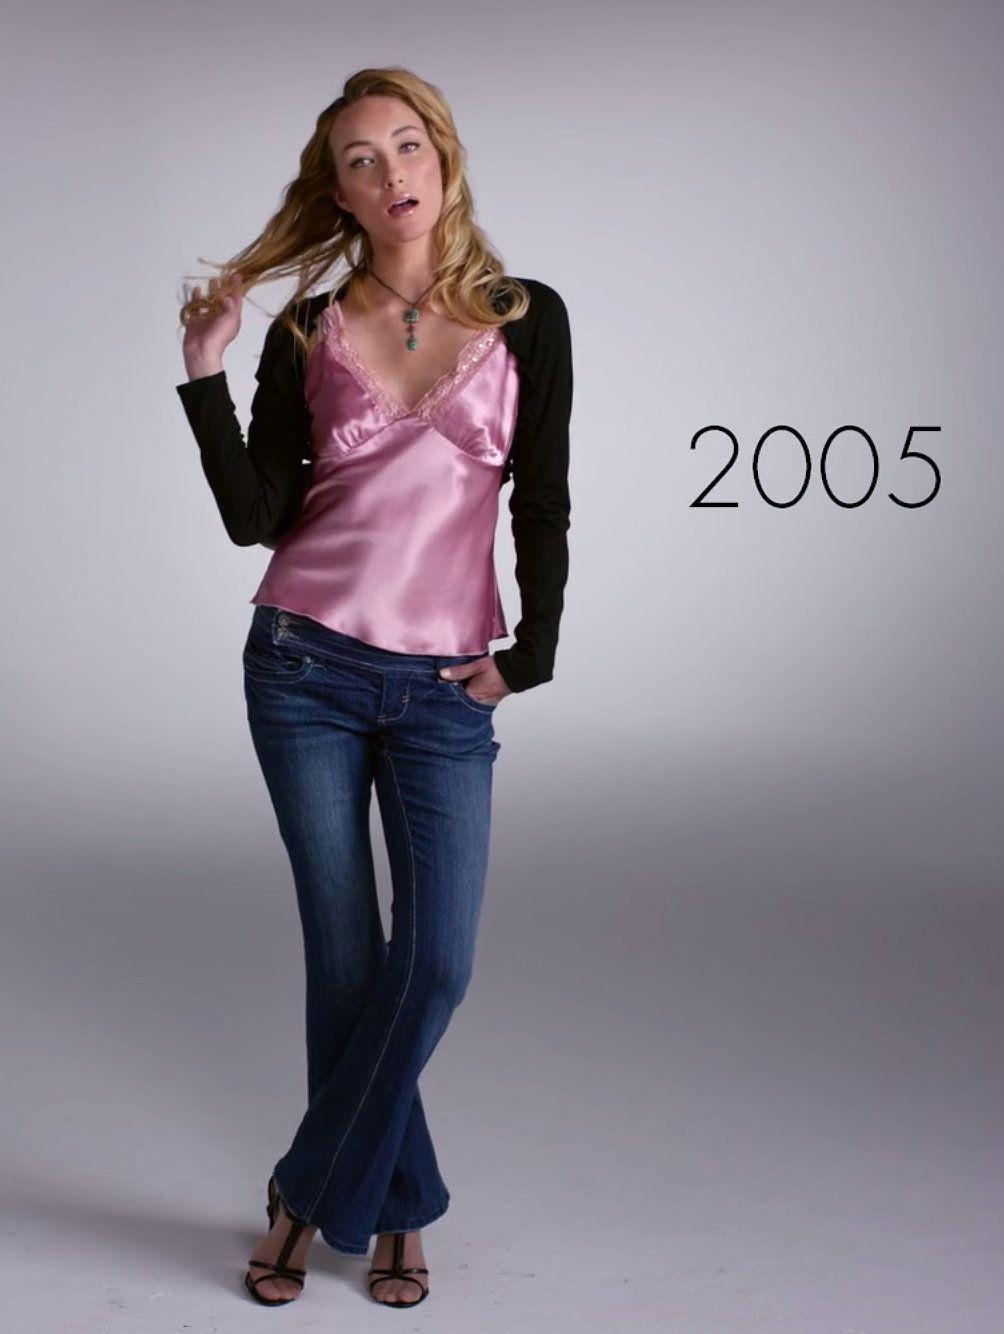 fashion 2005 - Google Search | Mode - fashion 2000-2012